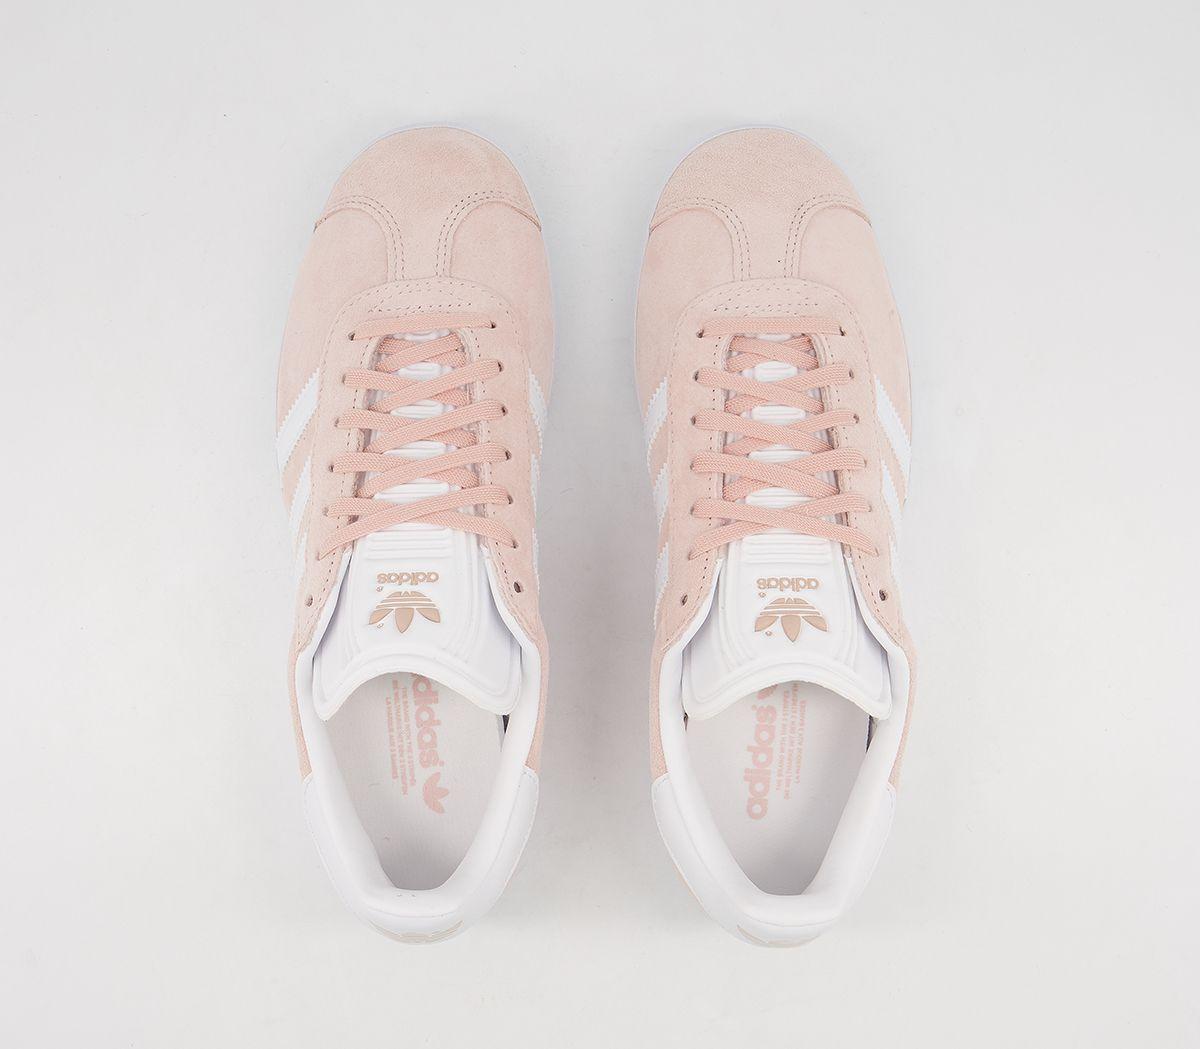 Adidas-Gazelle-Vapour-Pink-White-Trainers-Shoes thumbnail 12